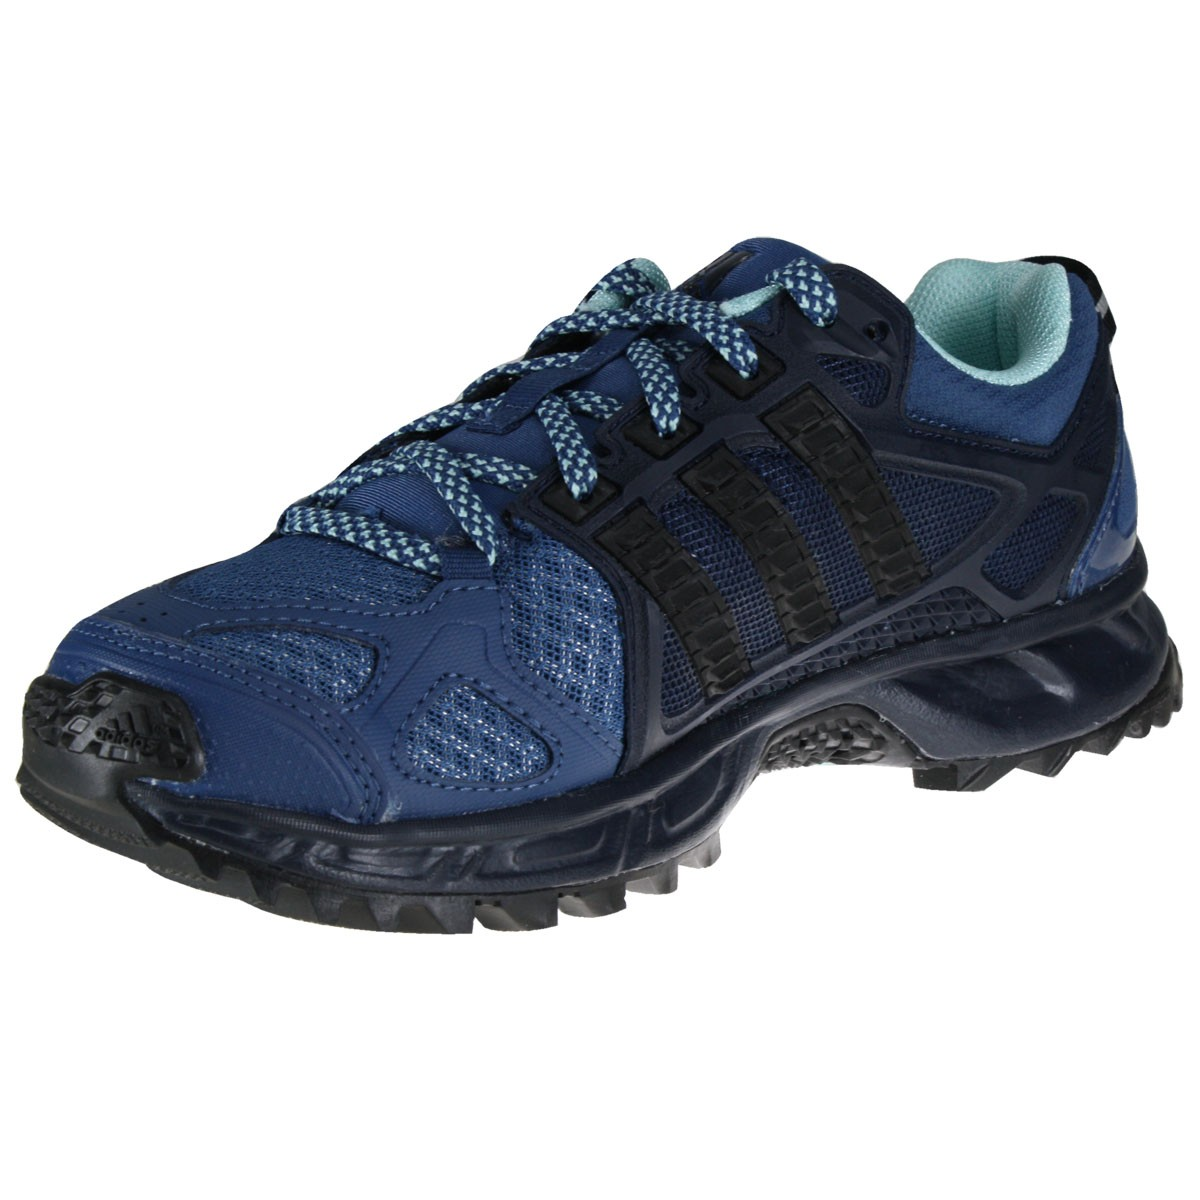 promo code 18b27 6fe60 zapatos adidas kanadia